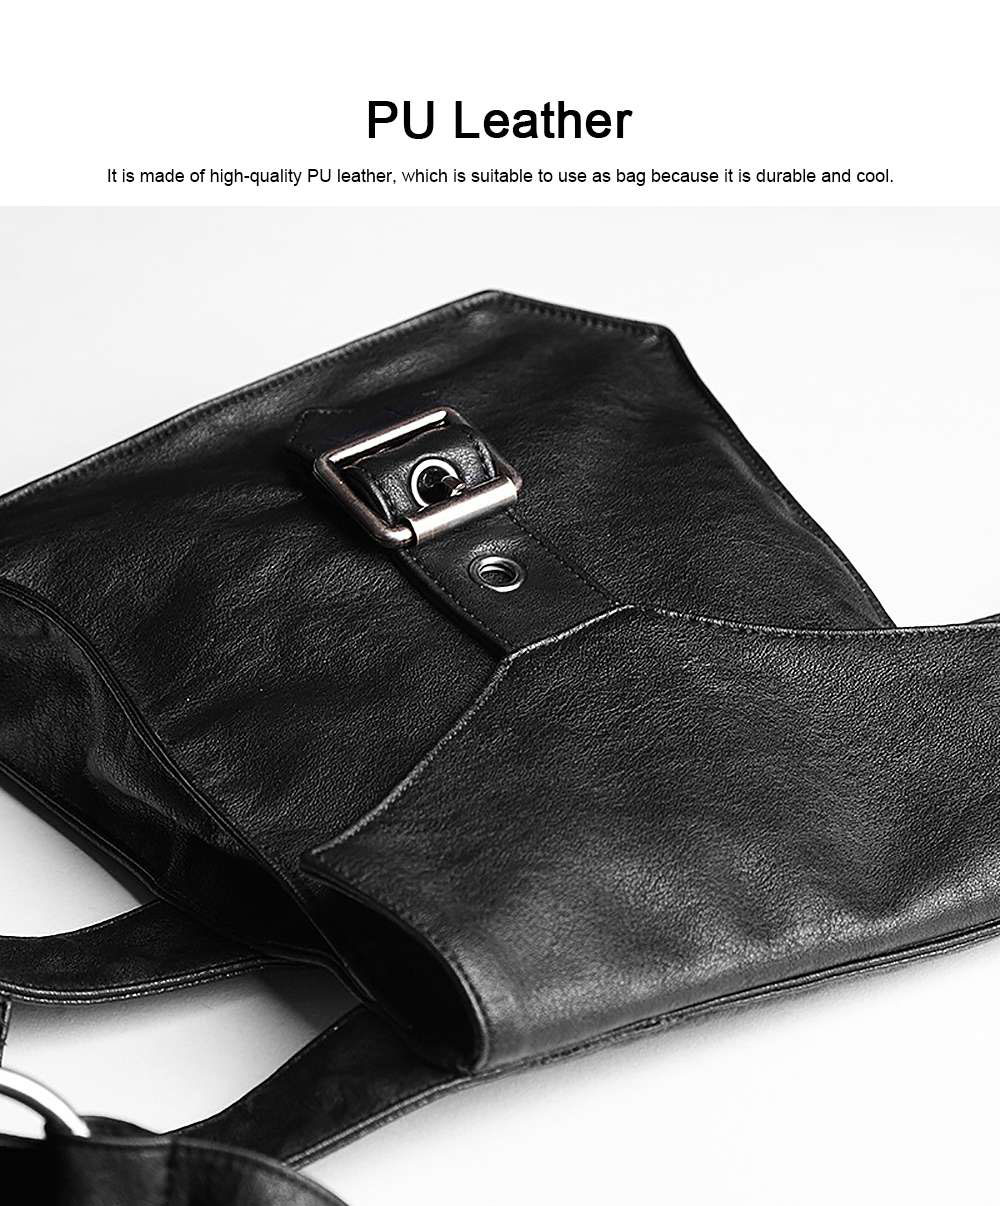 Square Shape Waist Strap Adjustable Belt Backpack, Locomotive Style Bag for Women, PU Leather Waistcoat Halloween Gift 5